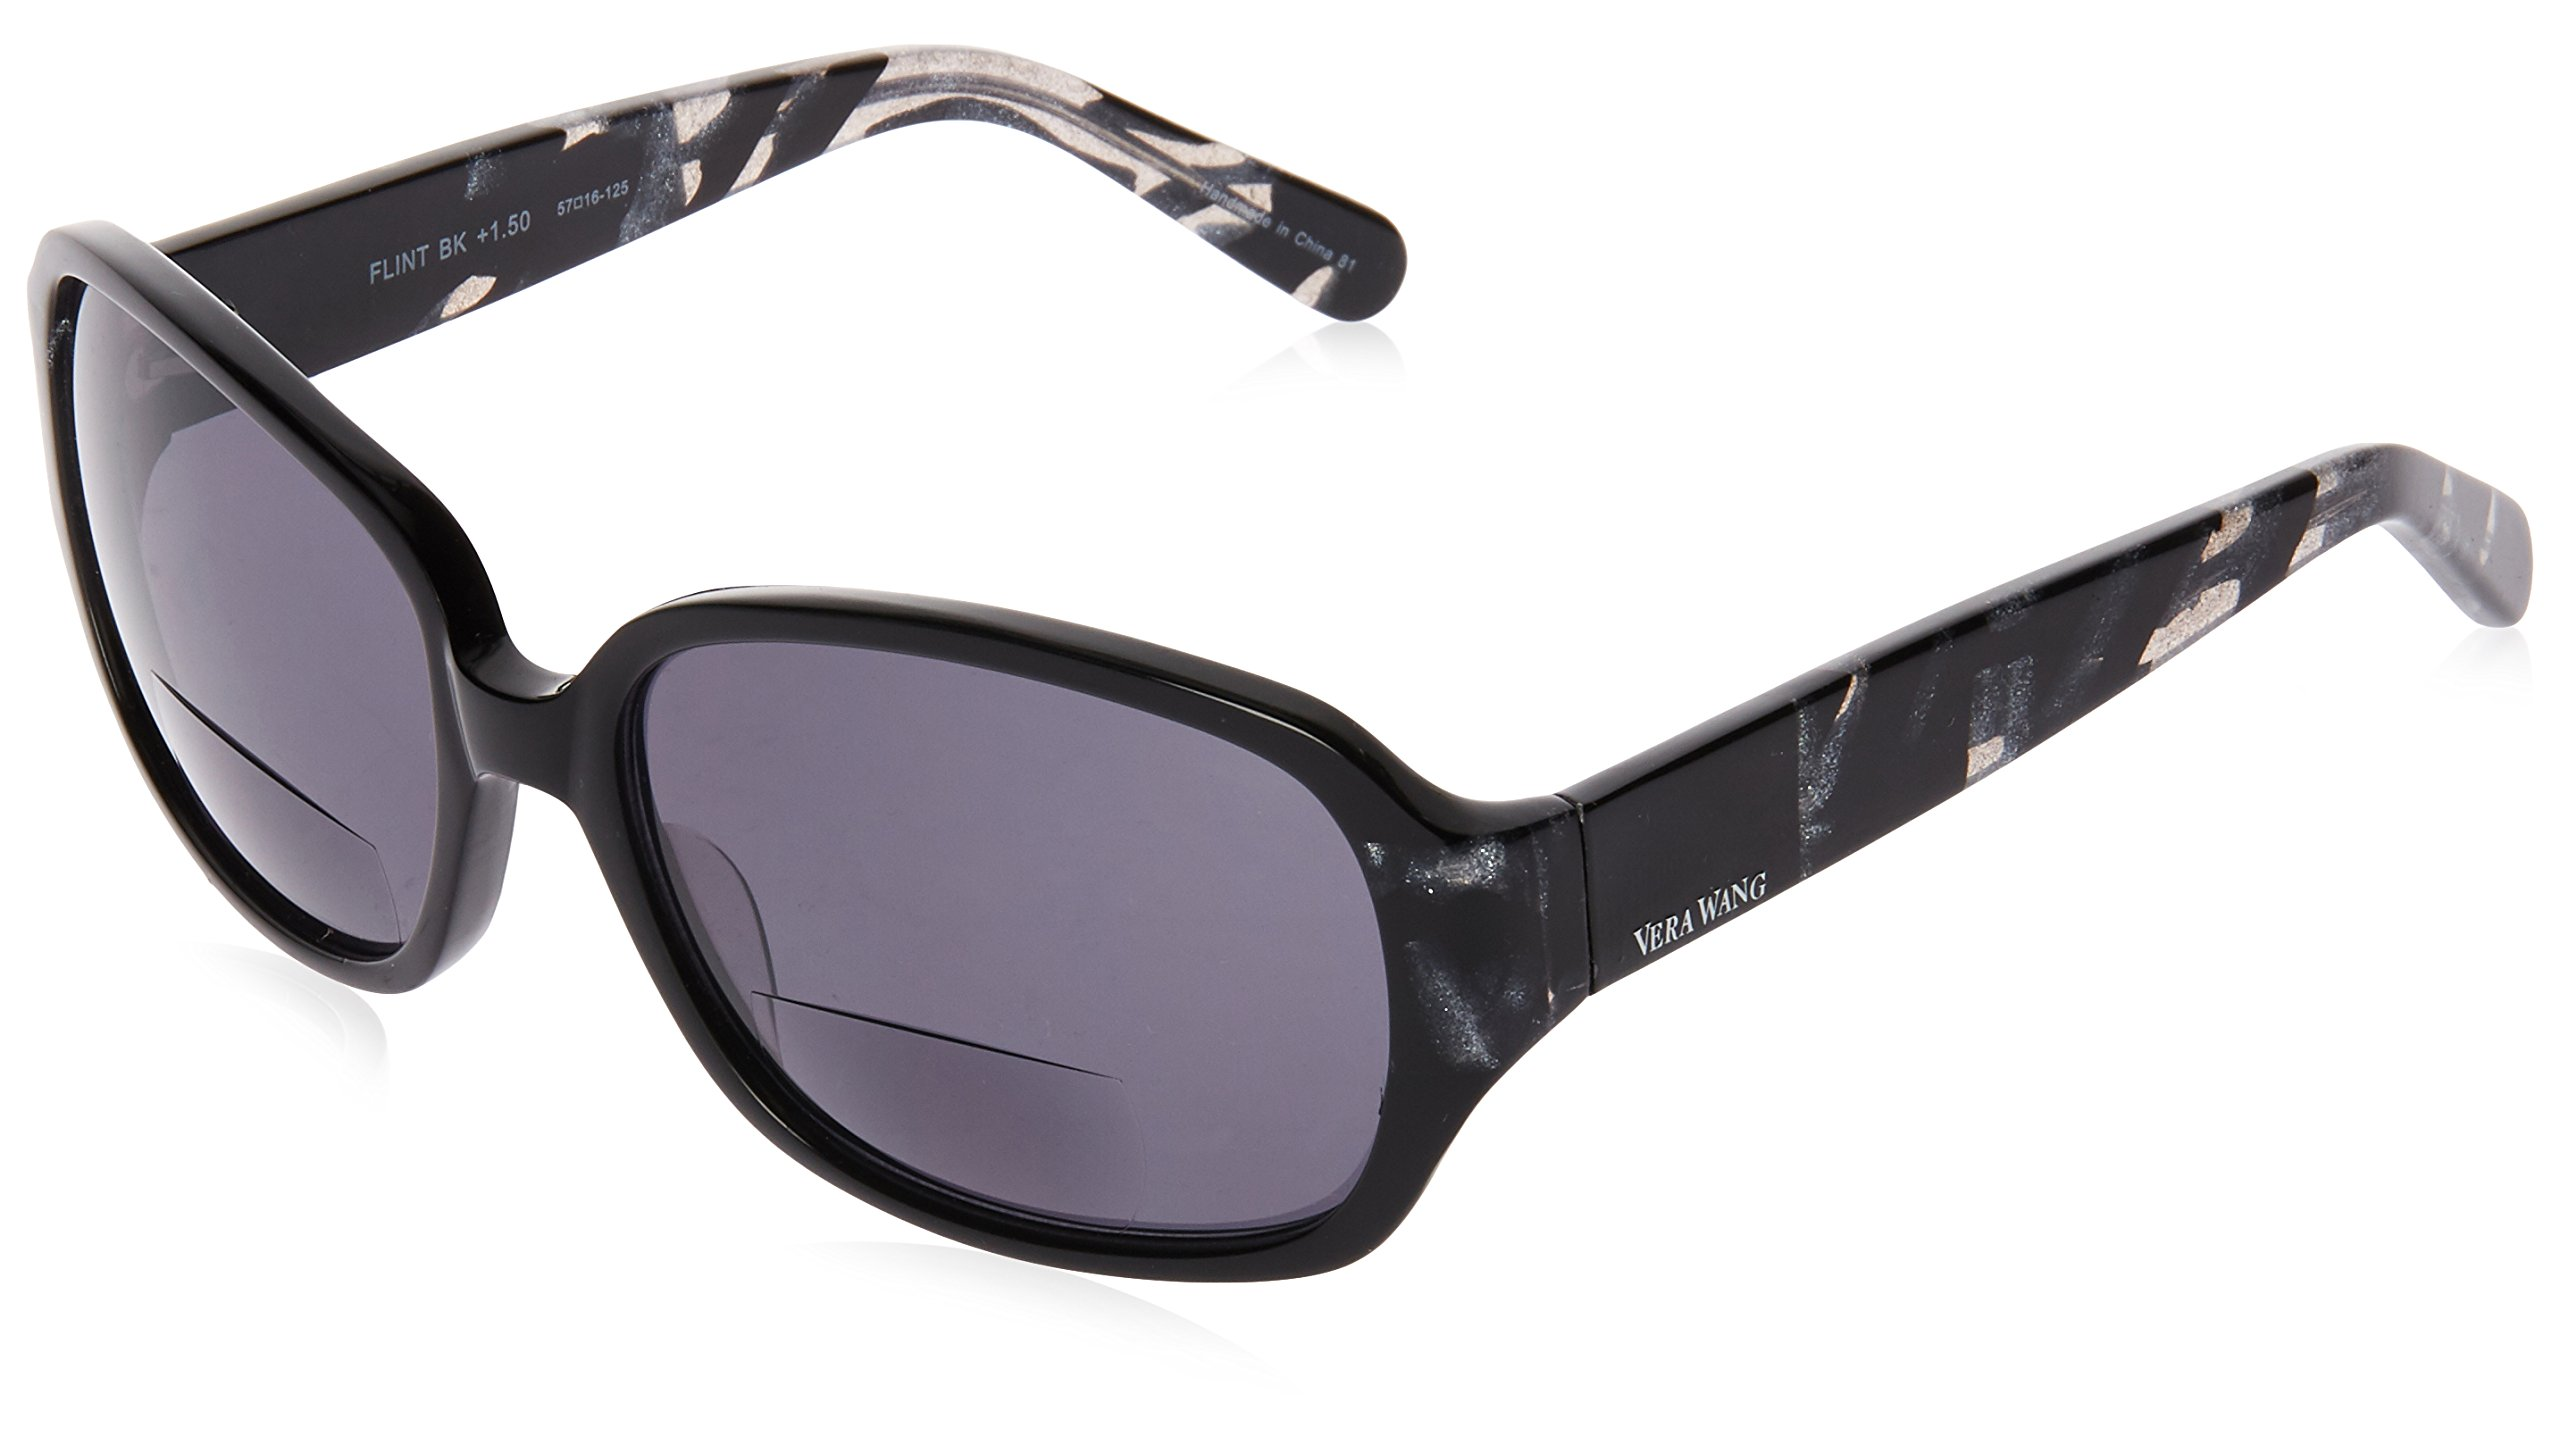 CDM product Vera Wang Women's Flint FLNTBK15 Square Reading Glasses, Black, 1.5 big image